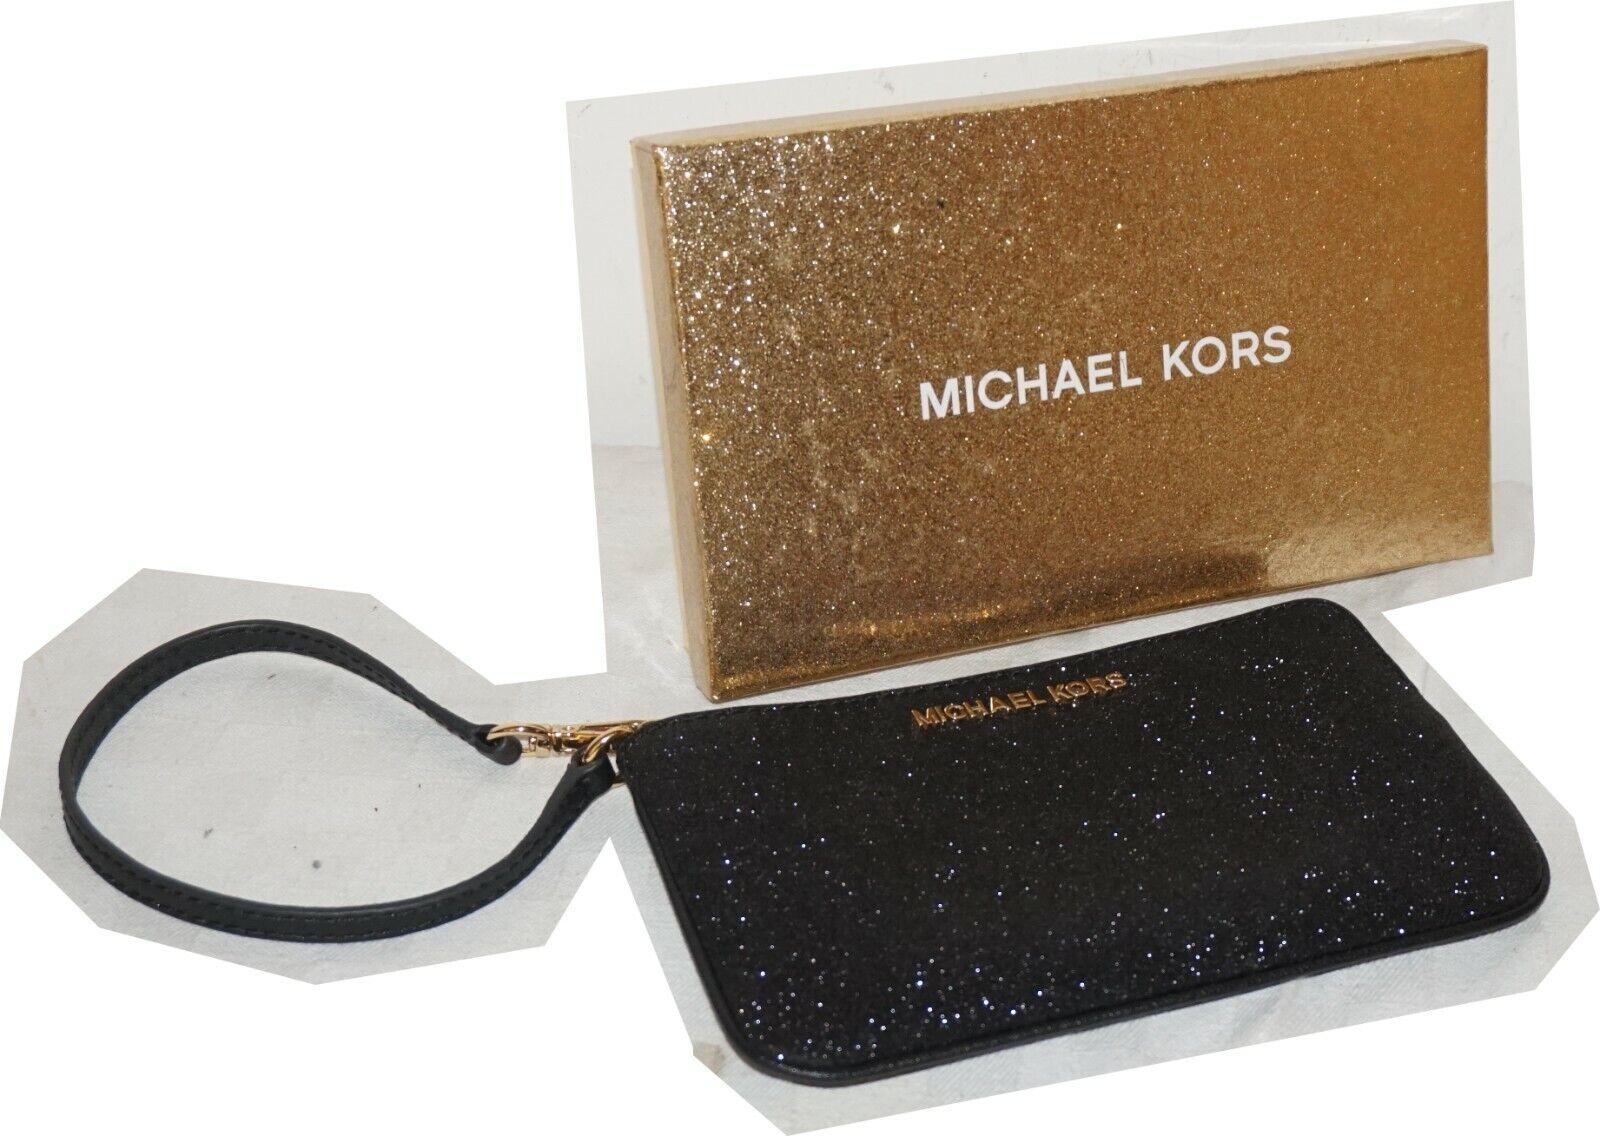 MICHAEL KORS Damen CLUTCH-Tasche WRISTLET GIFTABLES pale gold mit Glitzer